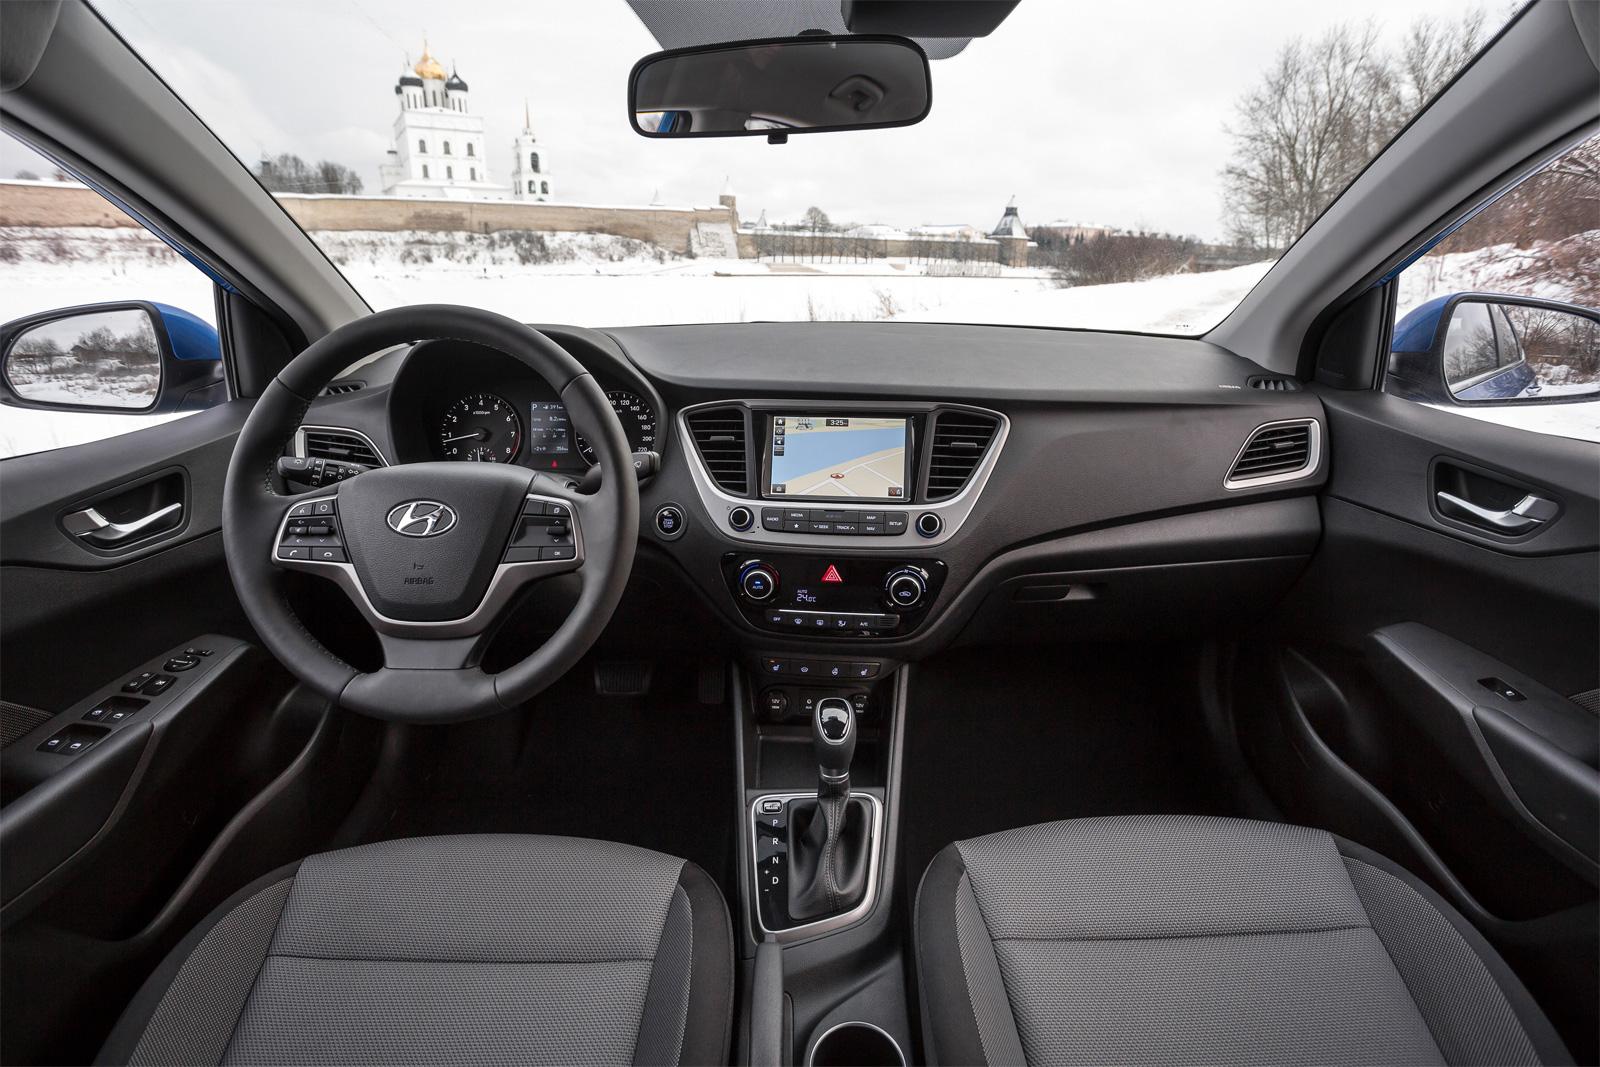 Hyundai Solaris 2 (2018-2019) цена и характеристики ...